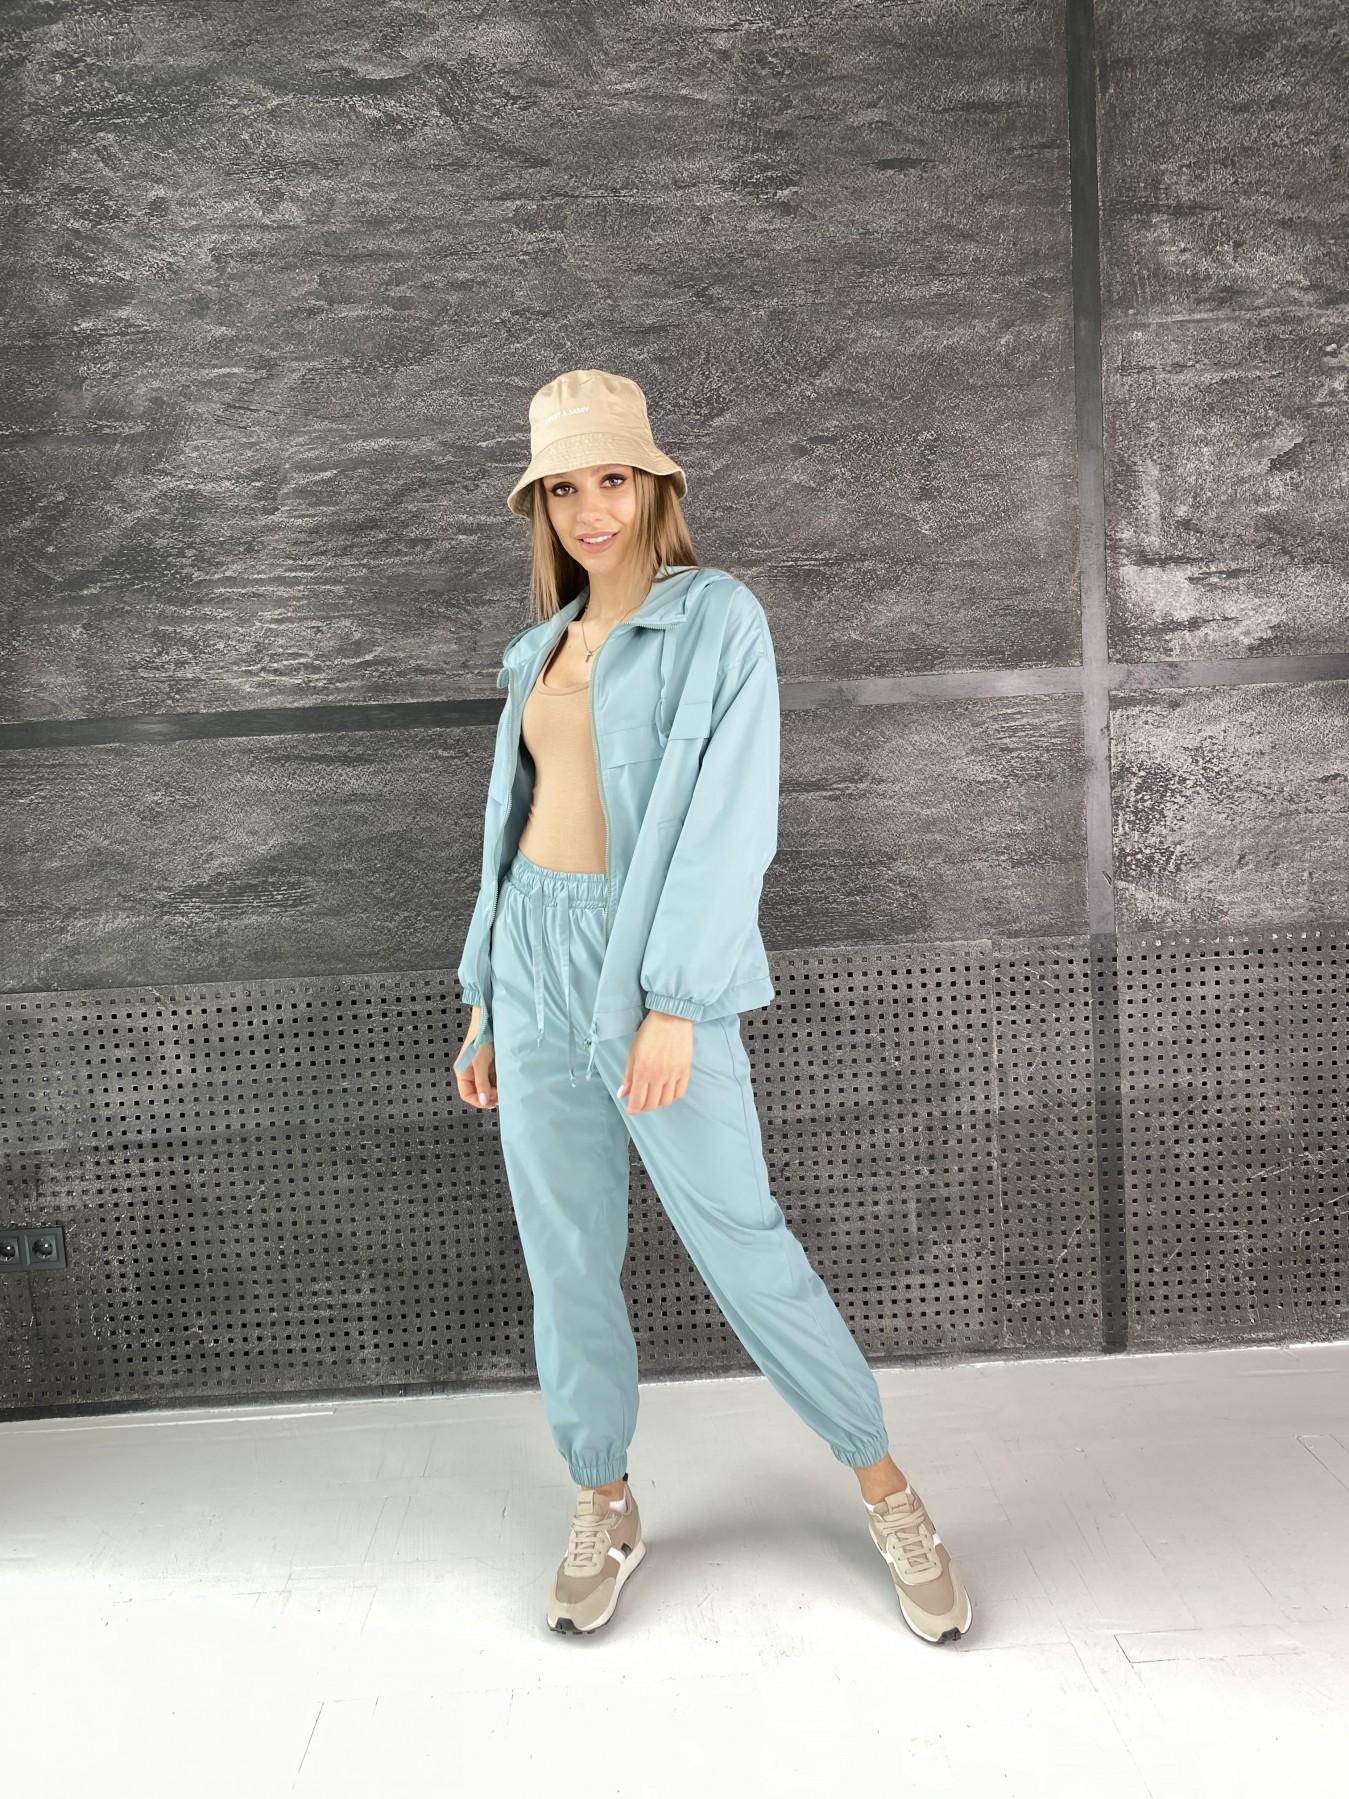 Фит костюм  из плащевой ткани Astra 11052 АРТ. 47536 Цвет: Олива - фото 10, интернет магазин tm-modus.ru